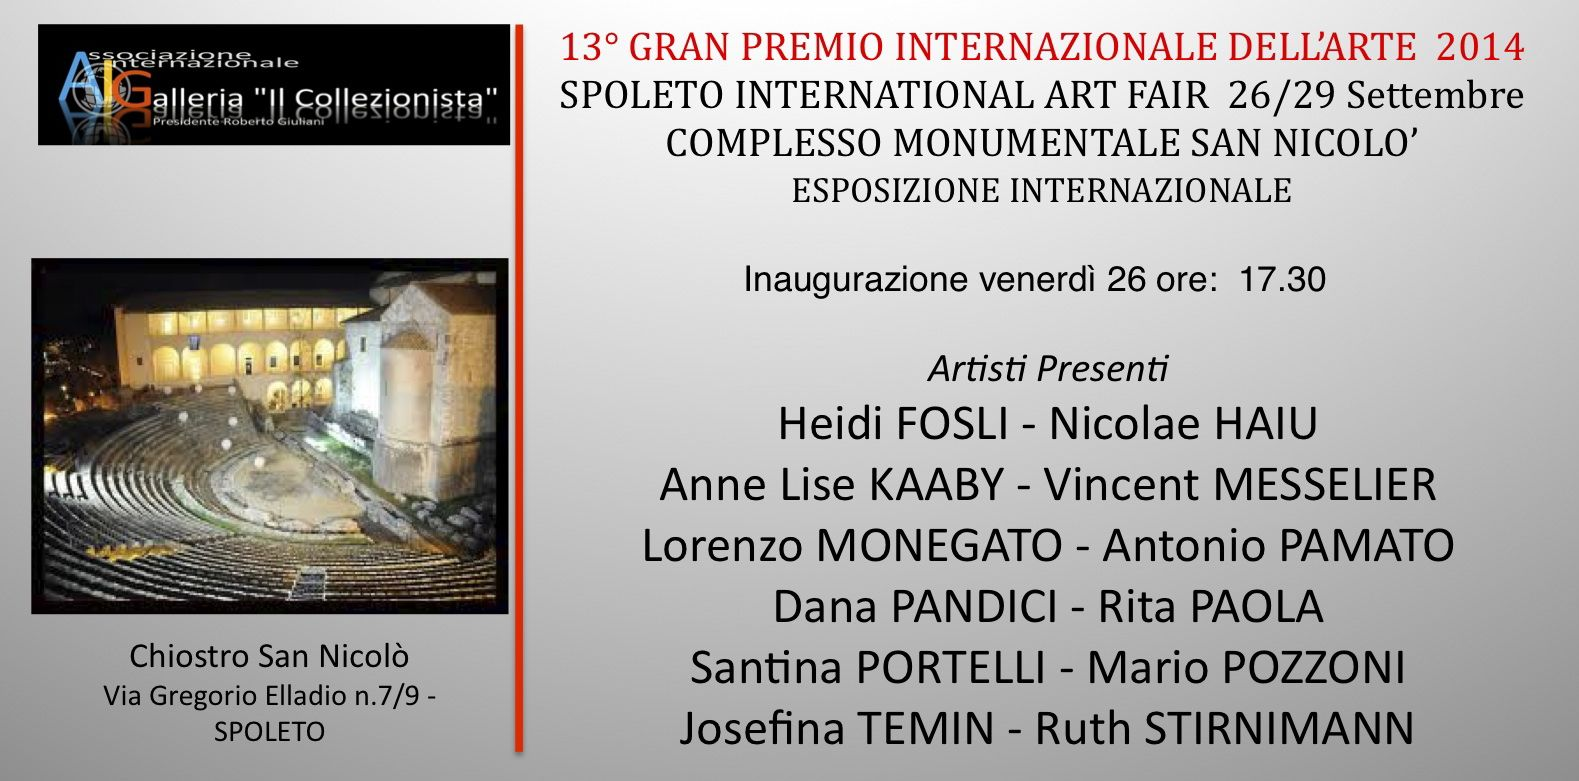 Invitation to collective exhibition at the Spoleto International Art Festival 2014